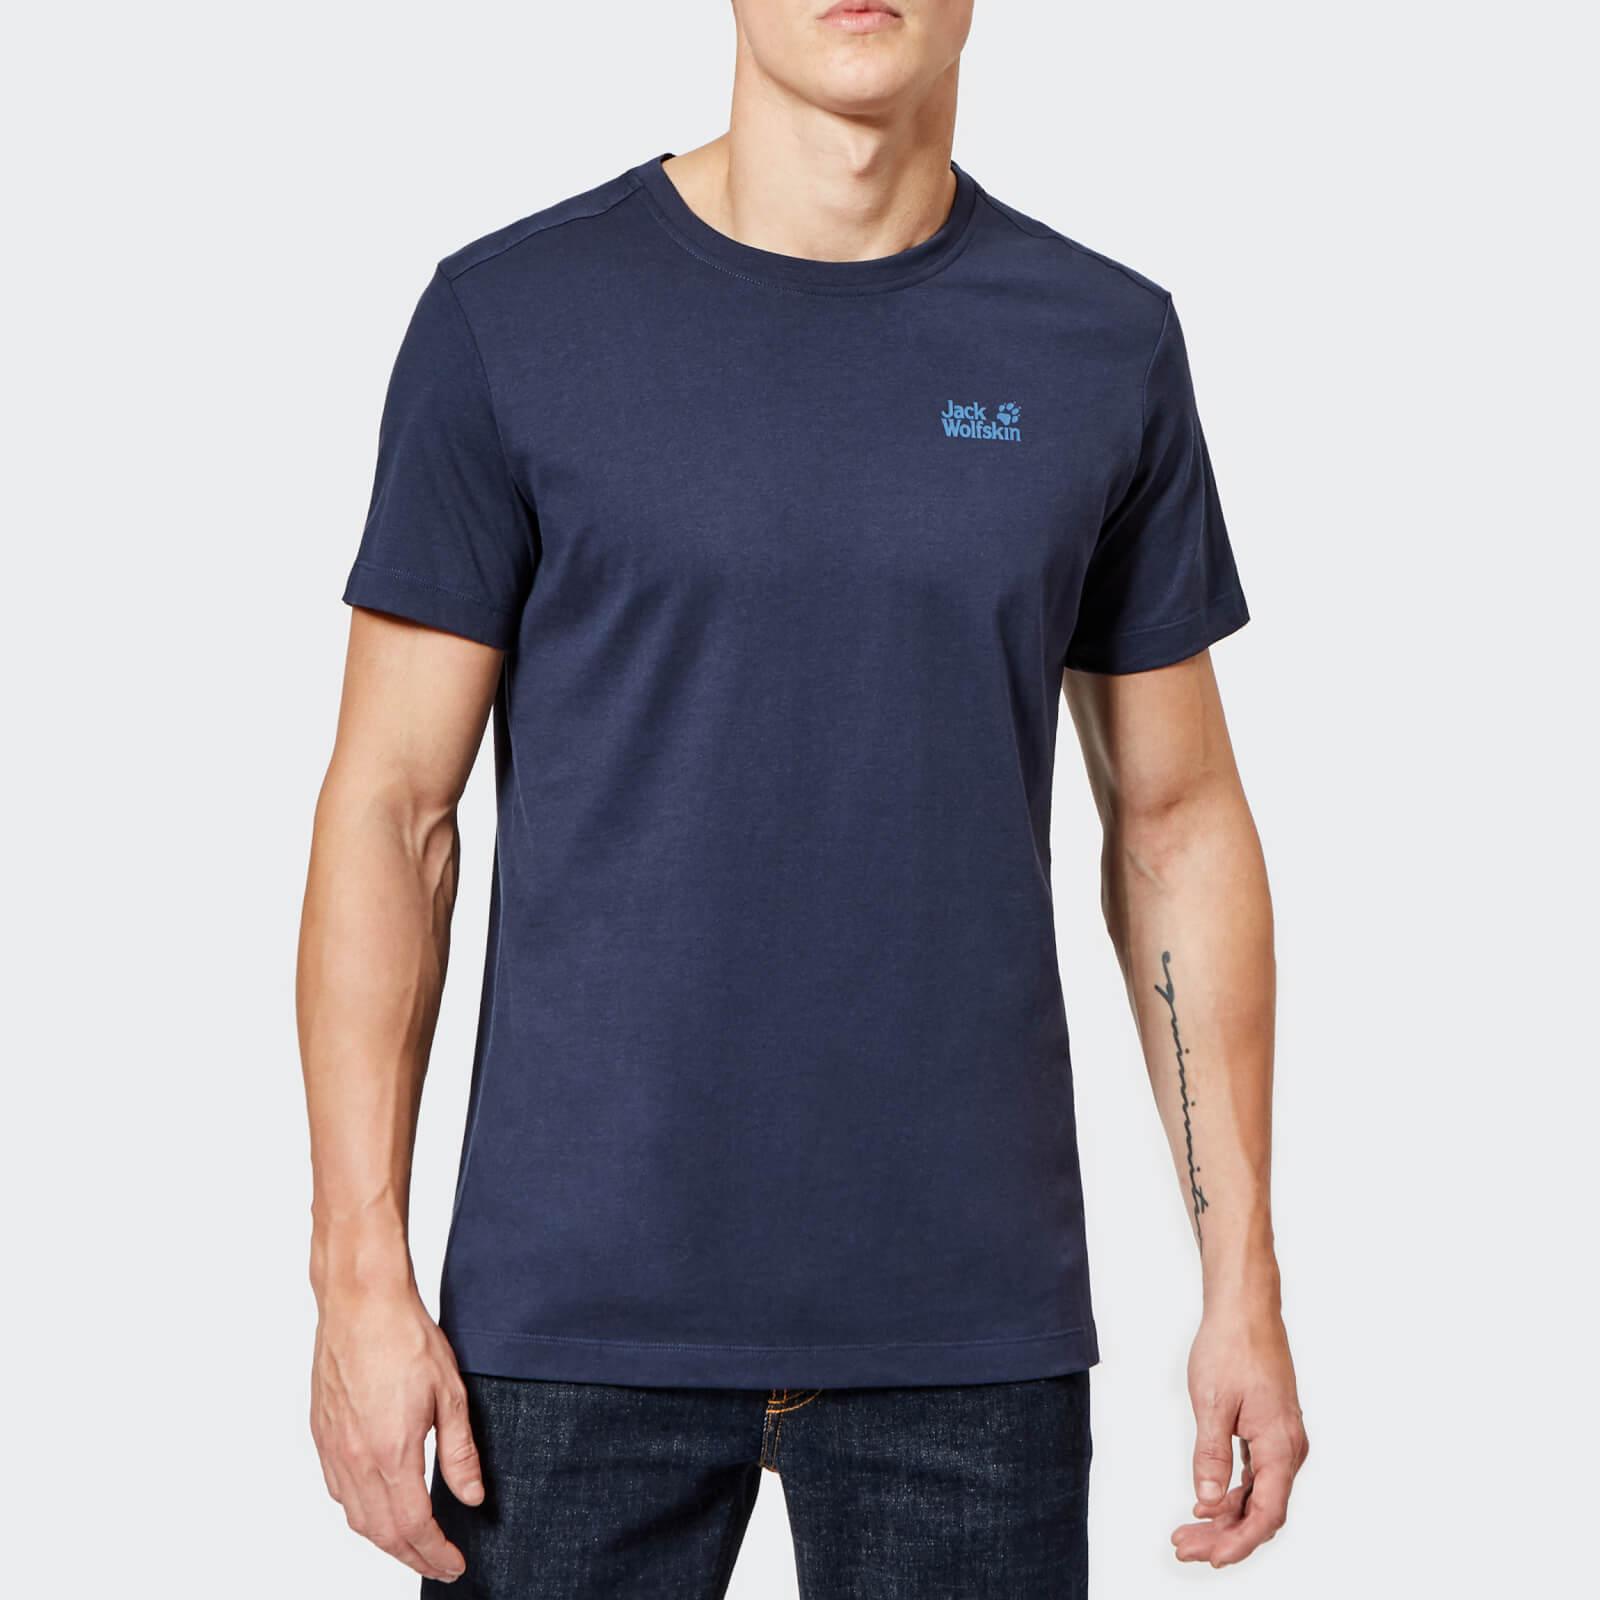 Jack Wolfskin Men's Essential Short Sleeve T-Shirt - Night Blue - S - Blue